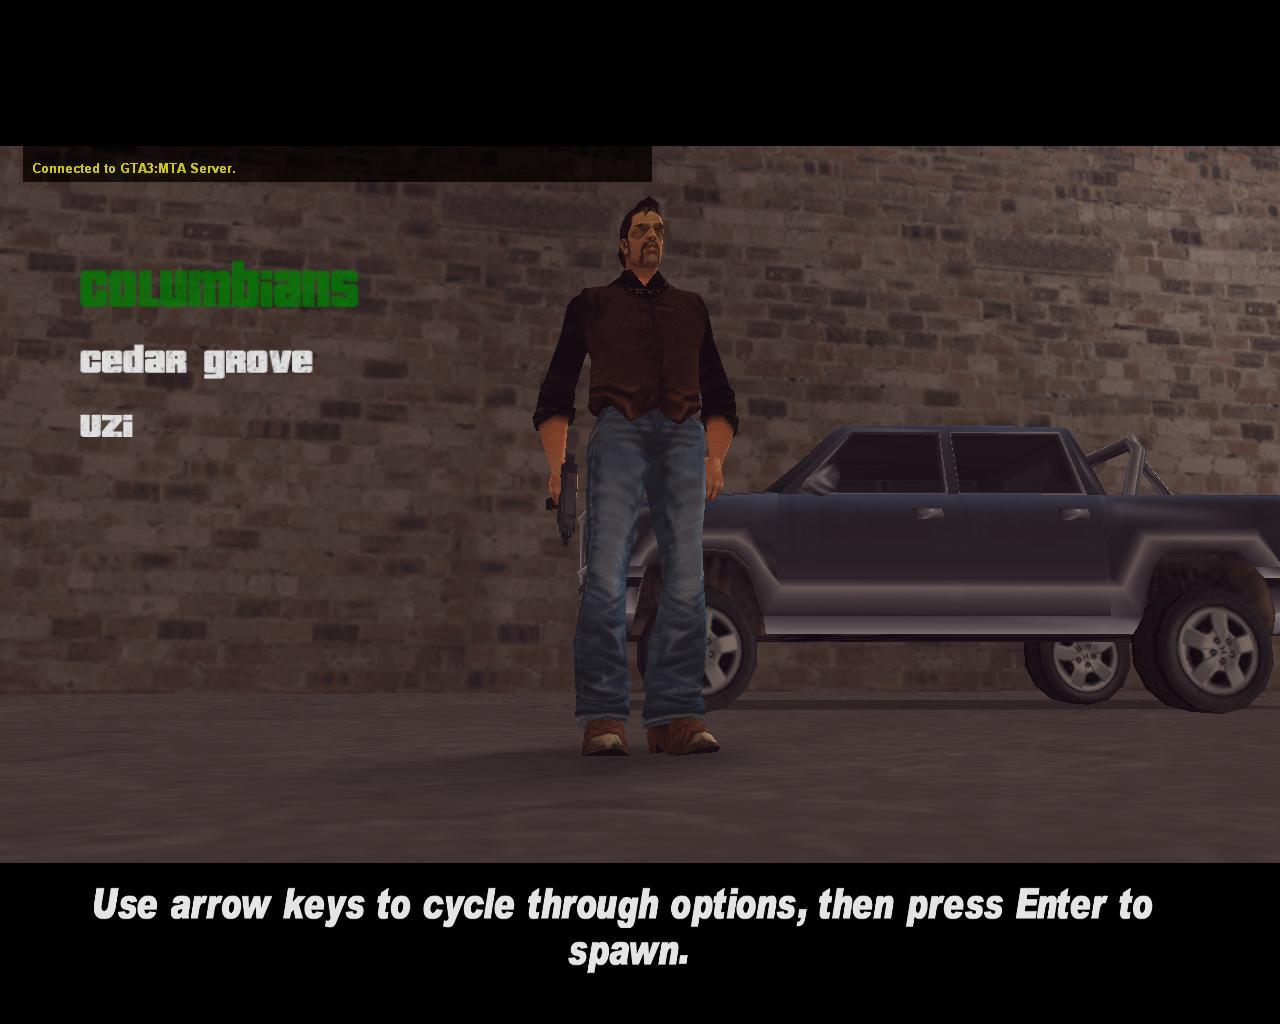 Shoreside spawn skin 1 - Columbian - Grand Theft Auto 3